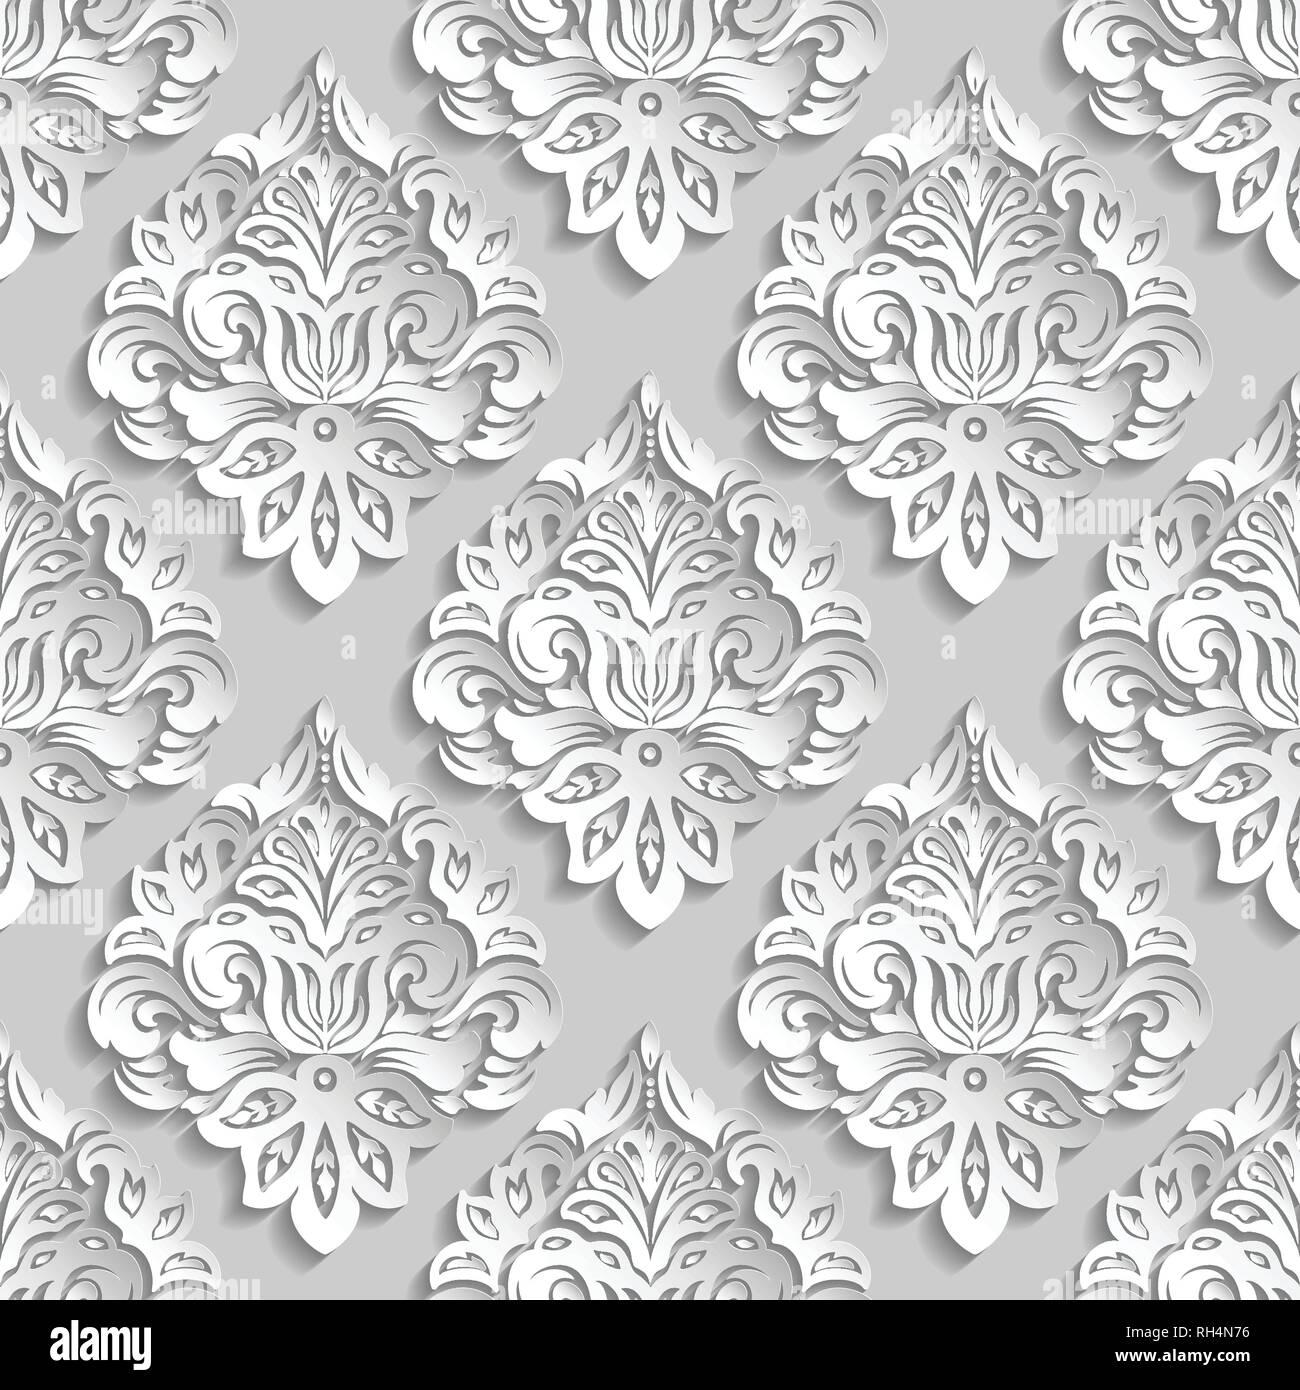 3d white pattern paper